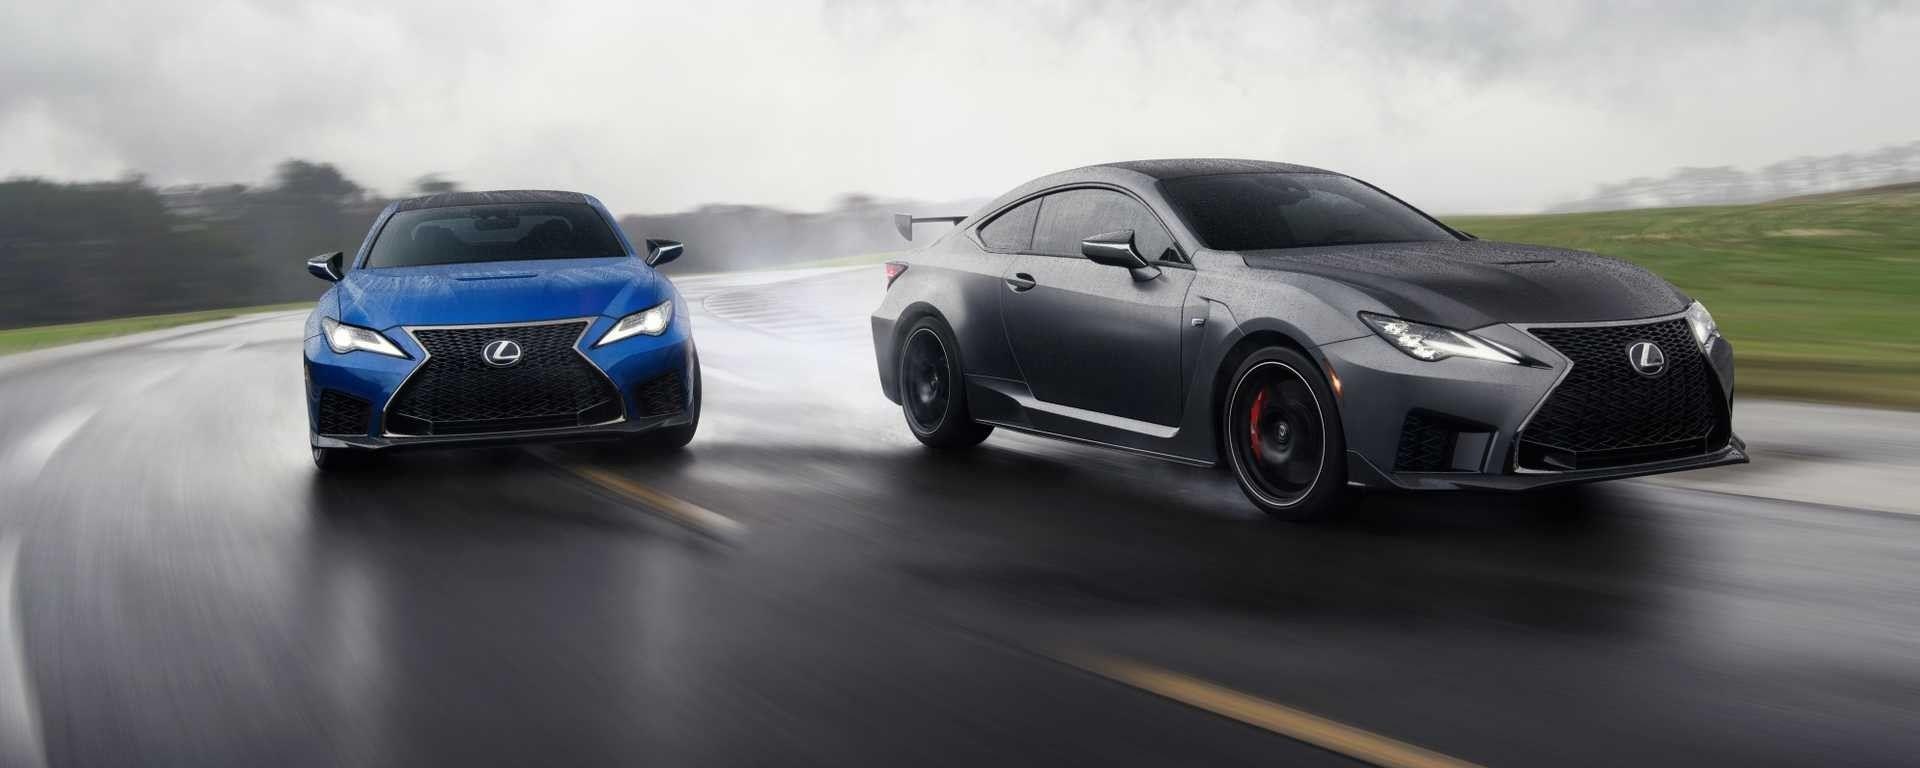 Detroit 2019, Lexus RC F restyling: ibrida? No, V8!